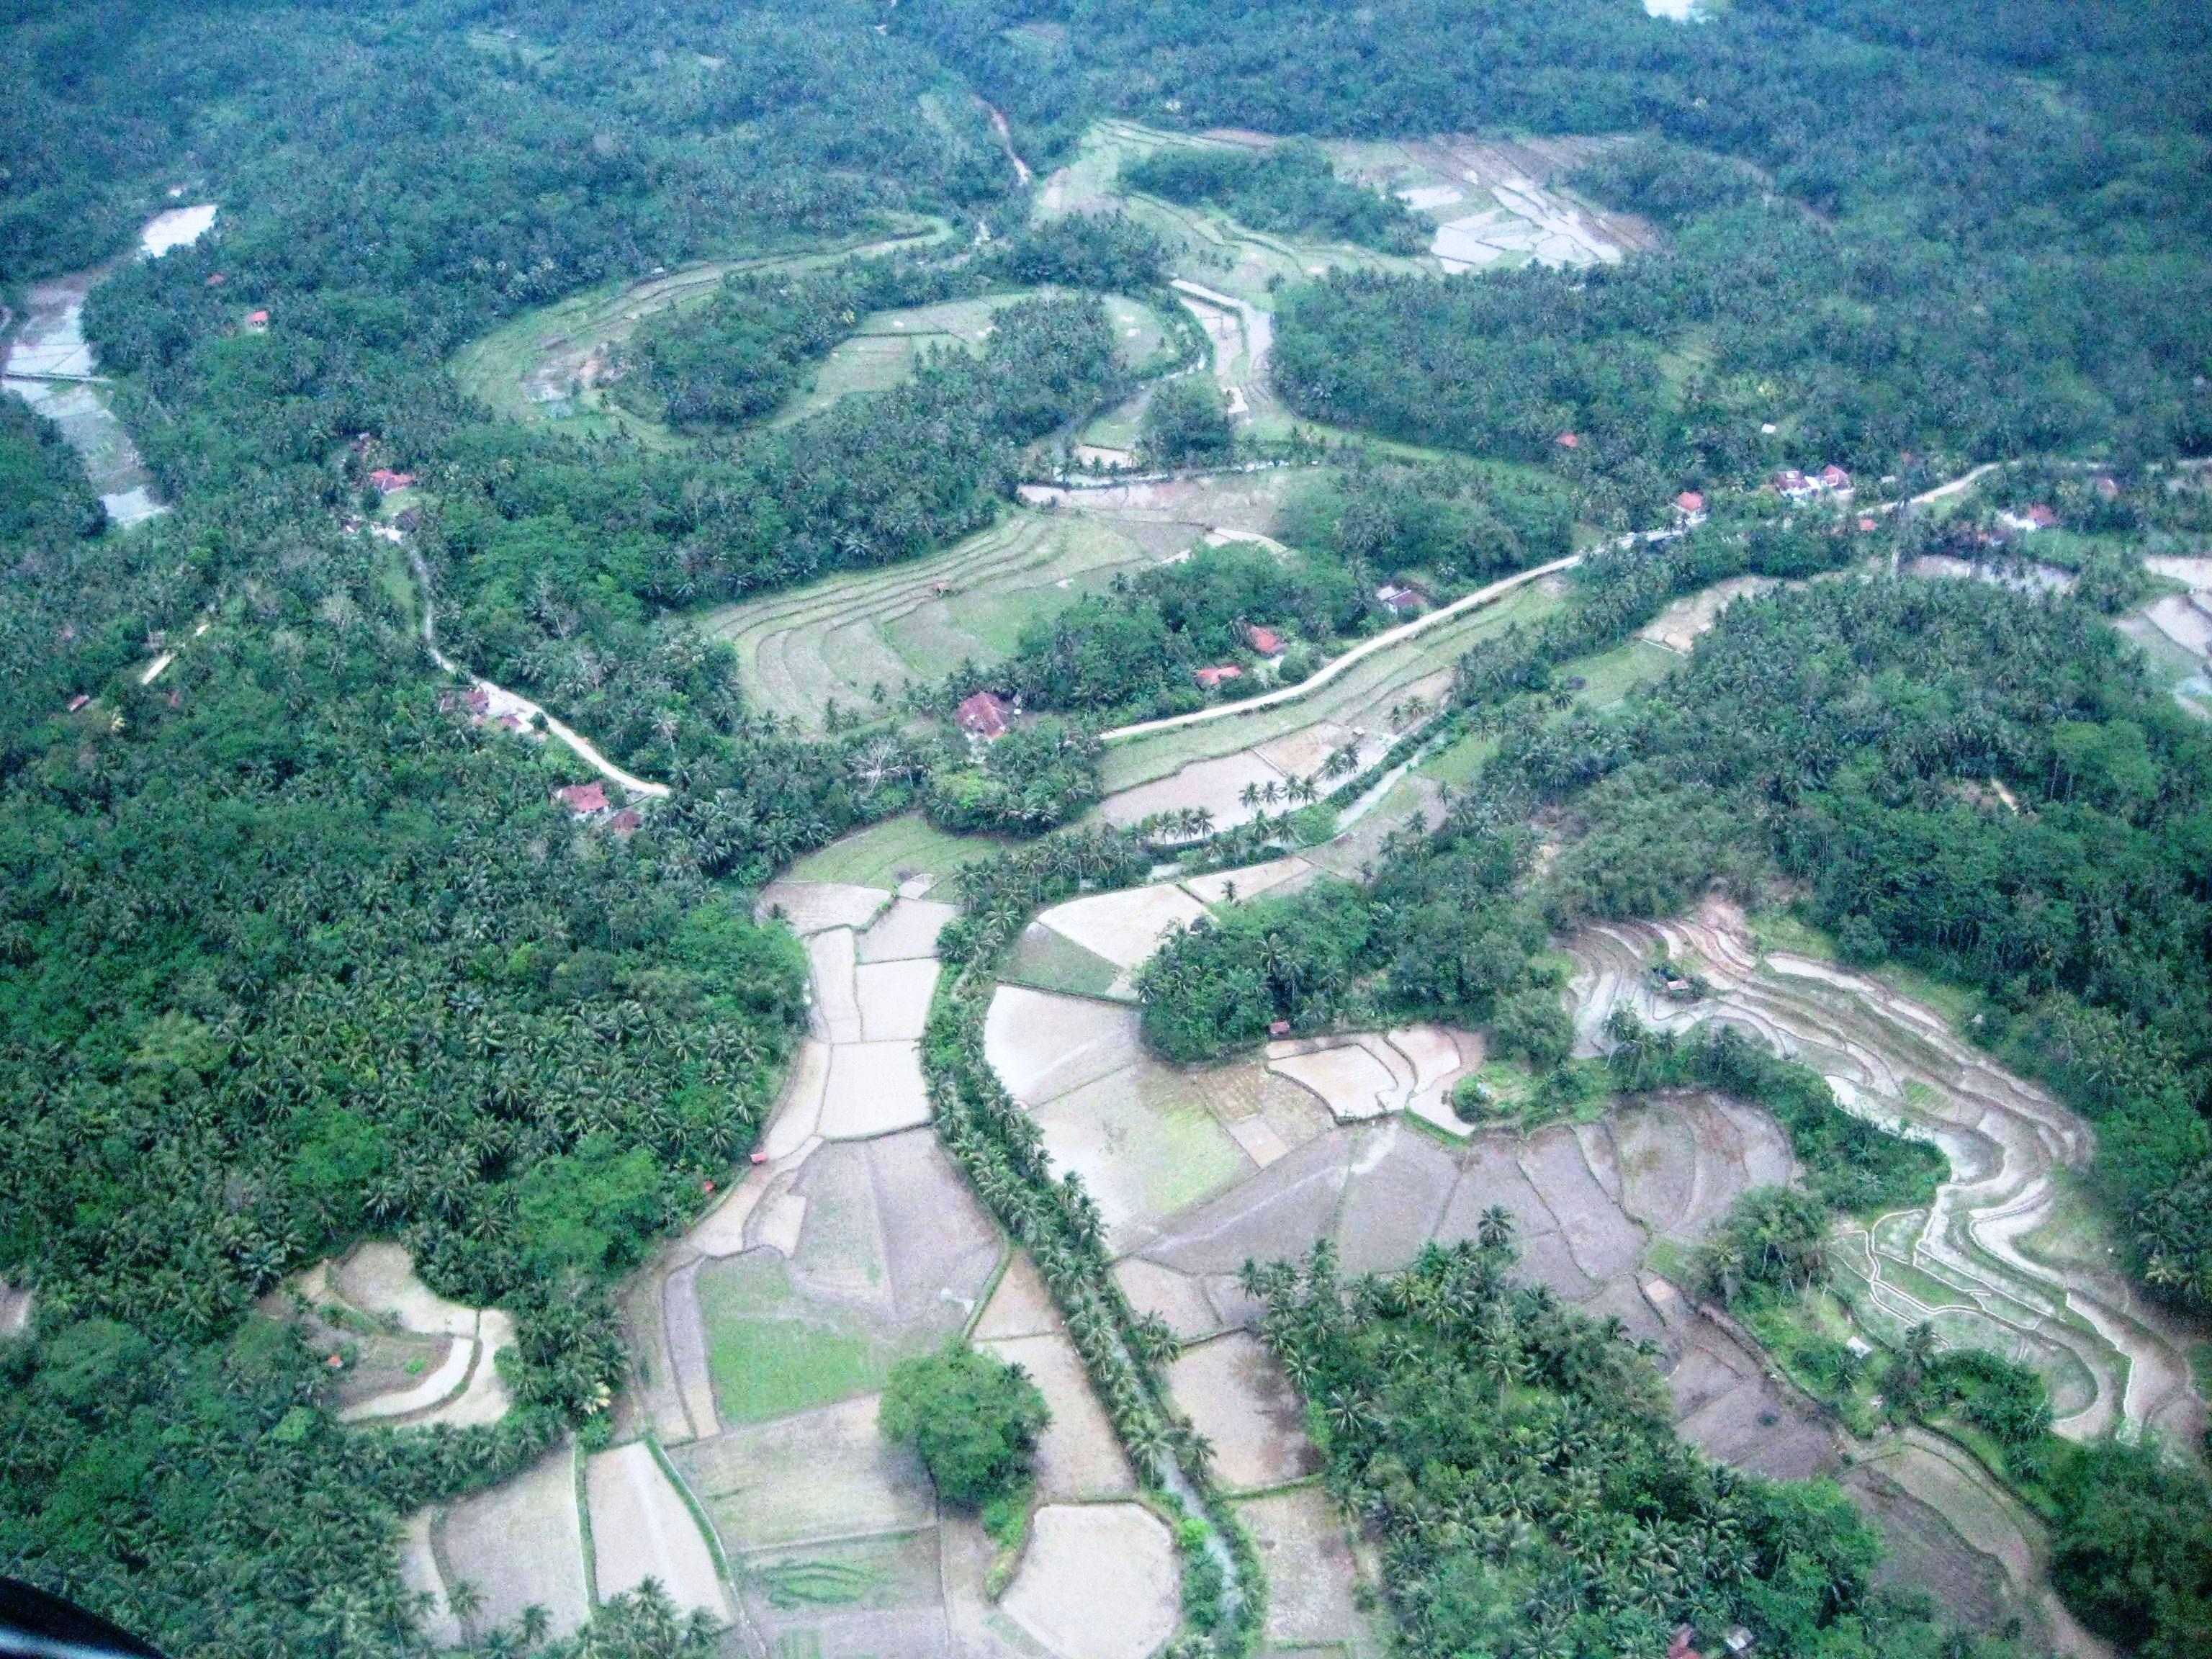 Batu Karas Rice fields